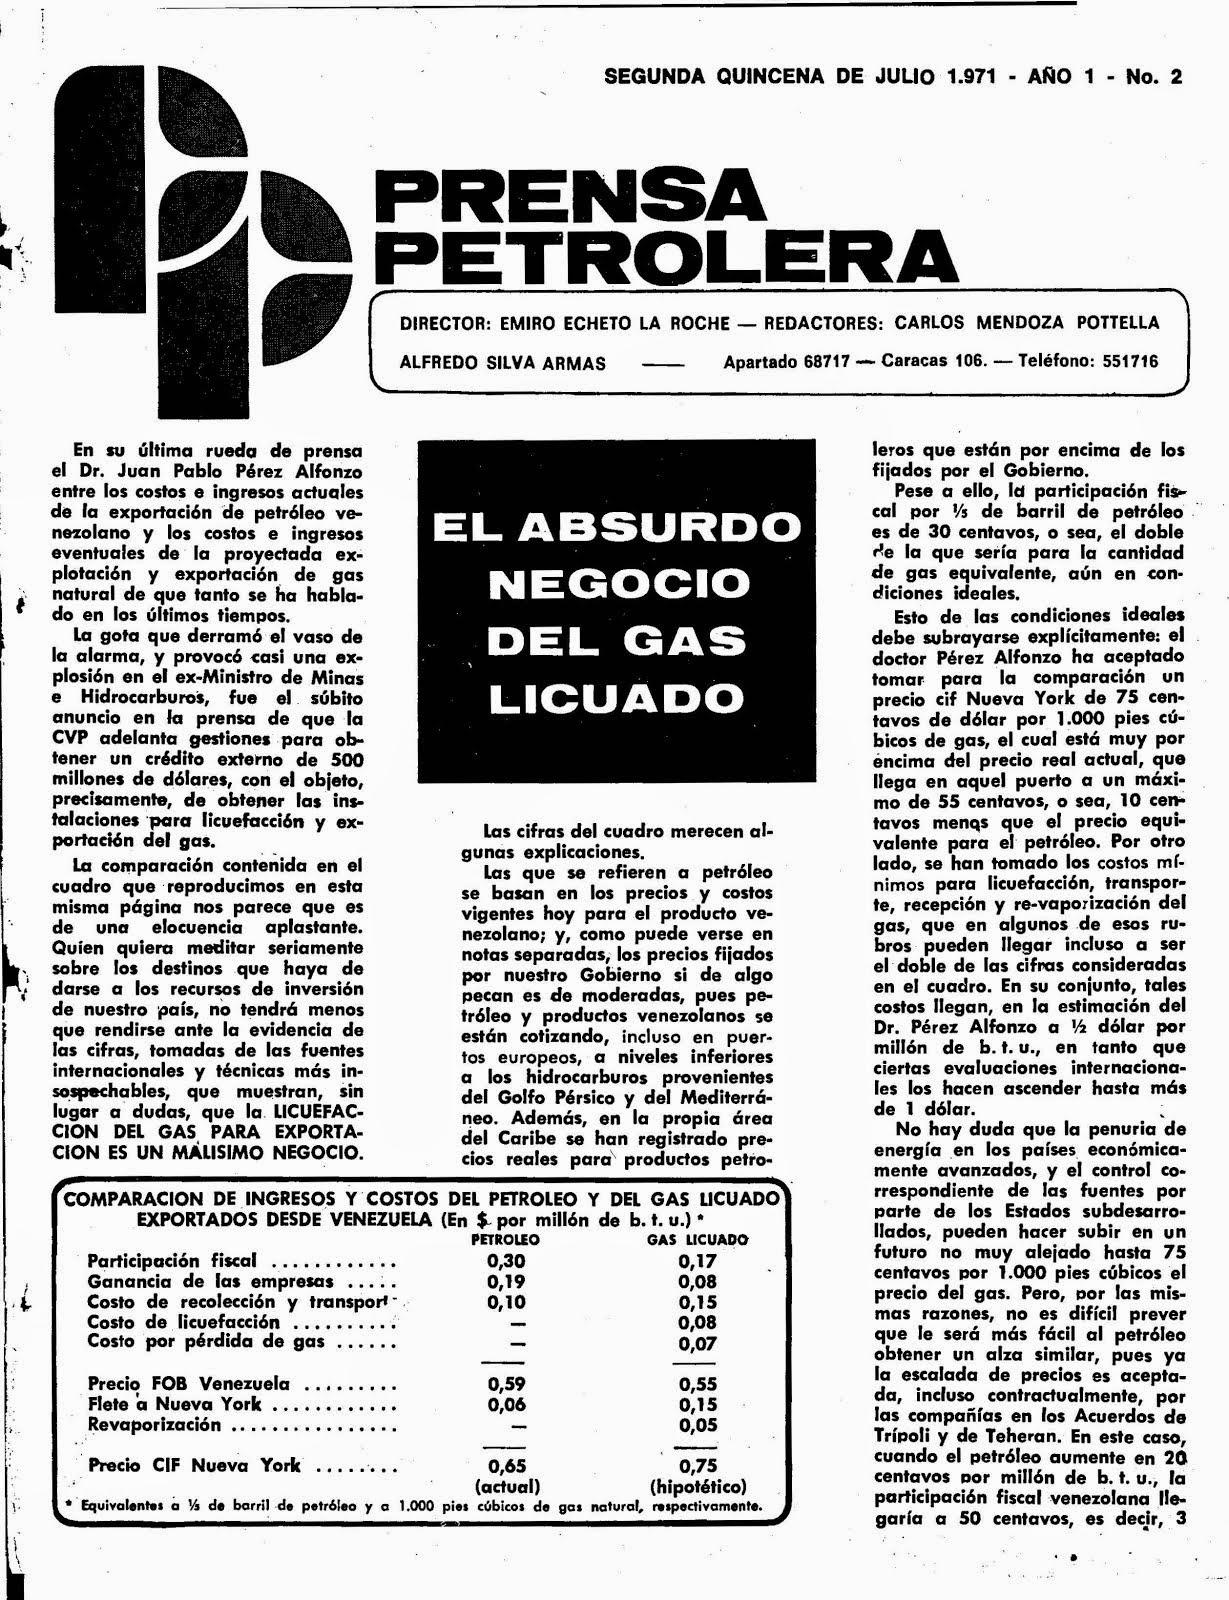 Explotacion petrolera yahoo dating